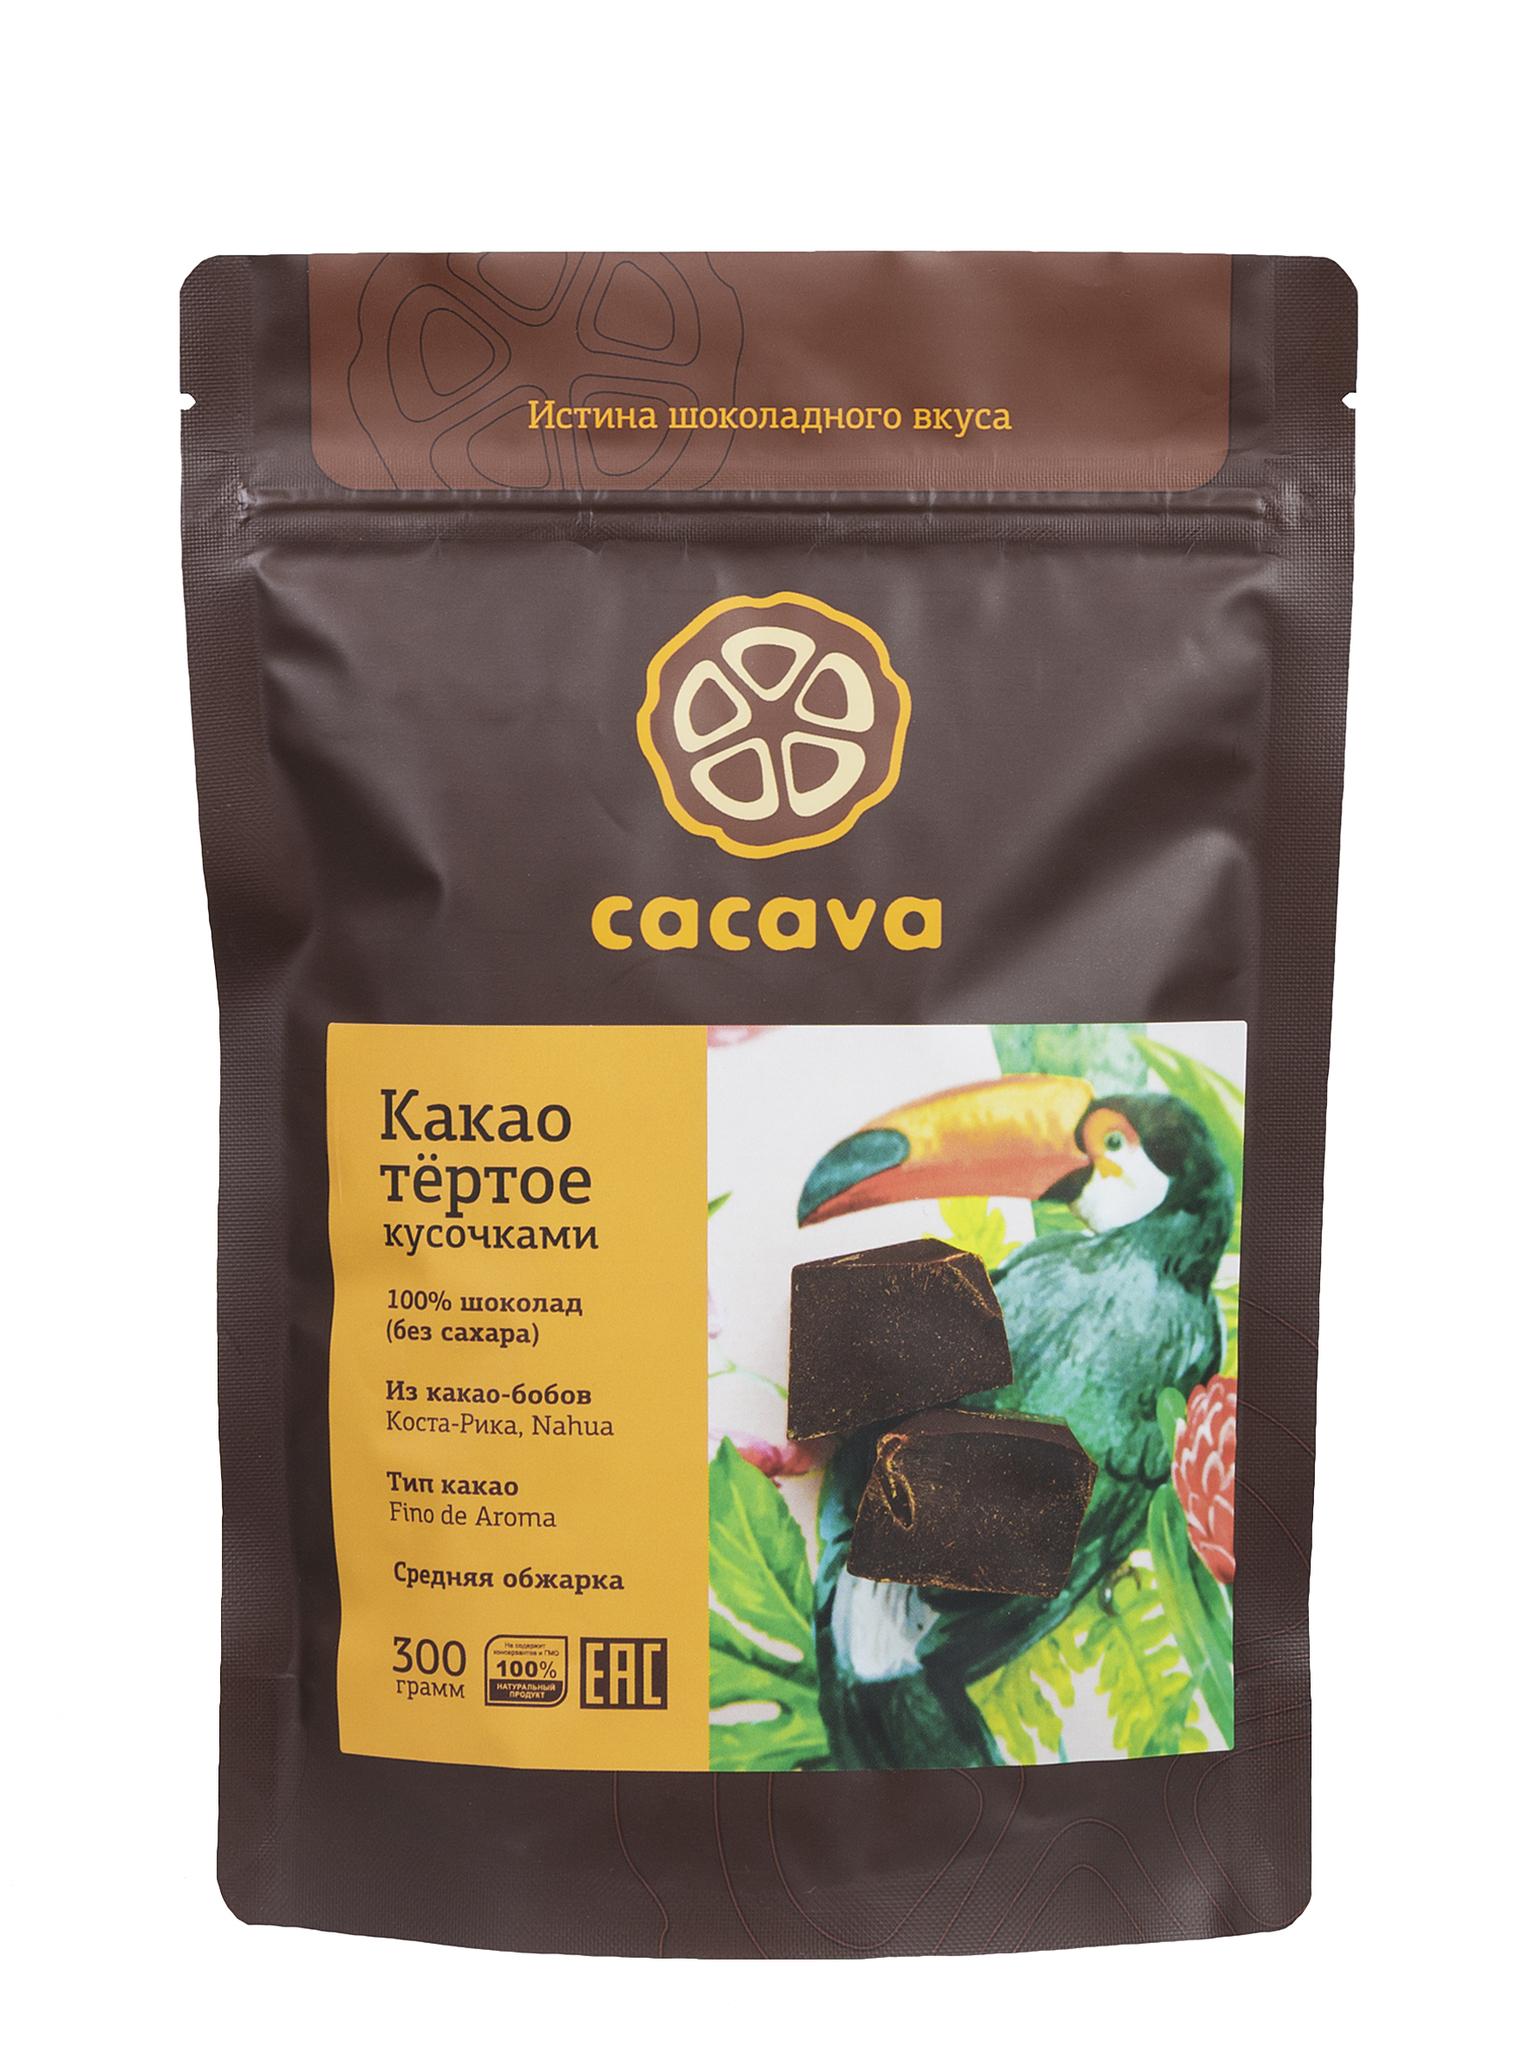 Какао тёртое кусочками (Коста-Рика), упаковка 300 грамм